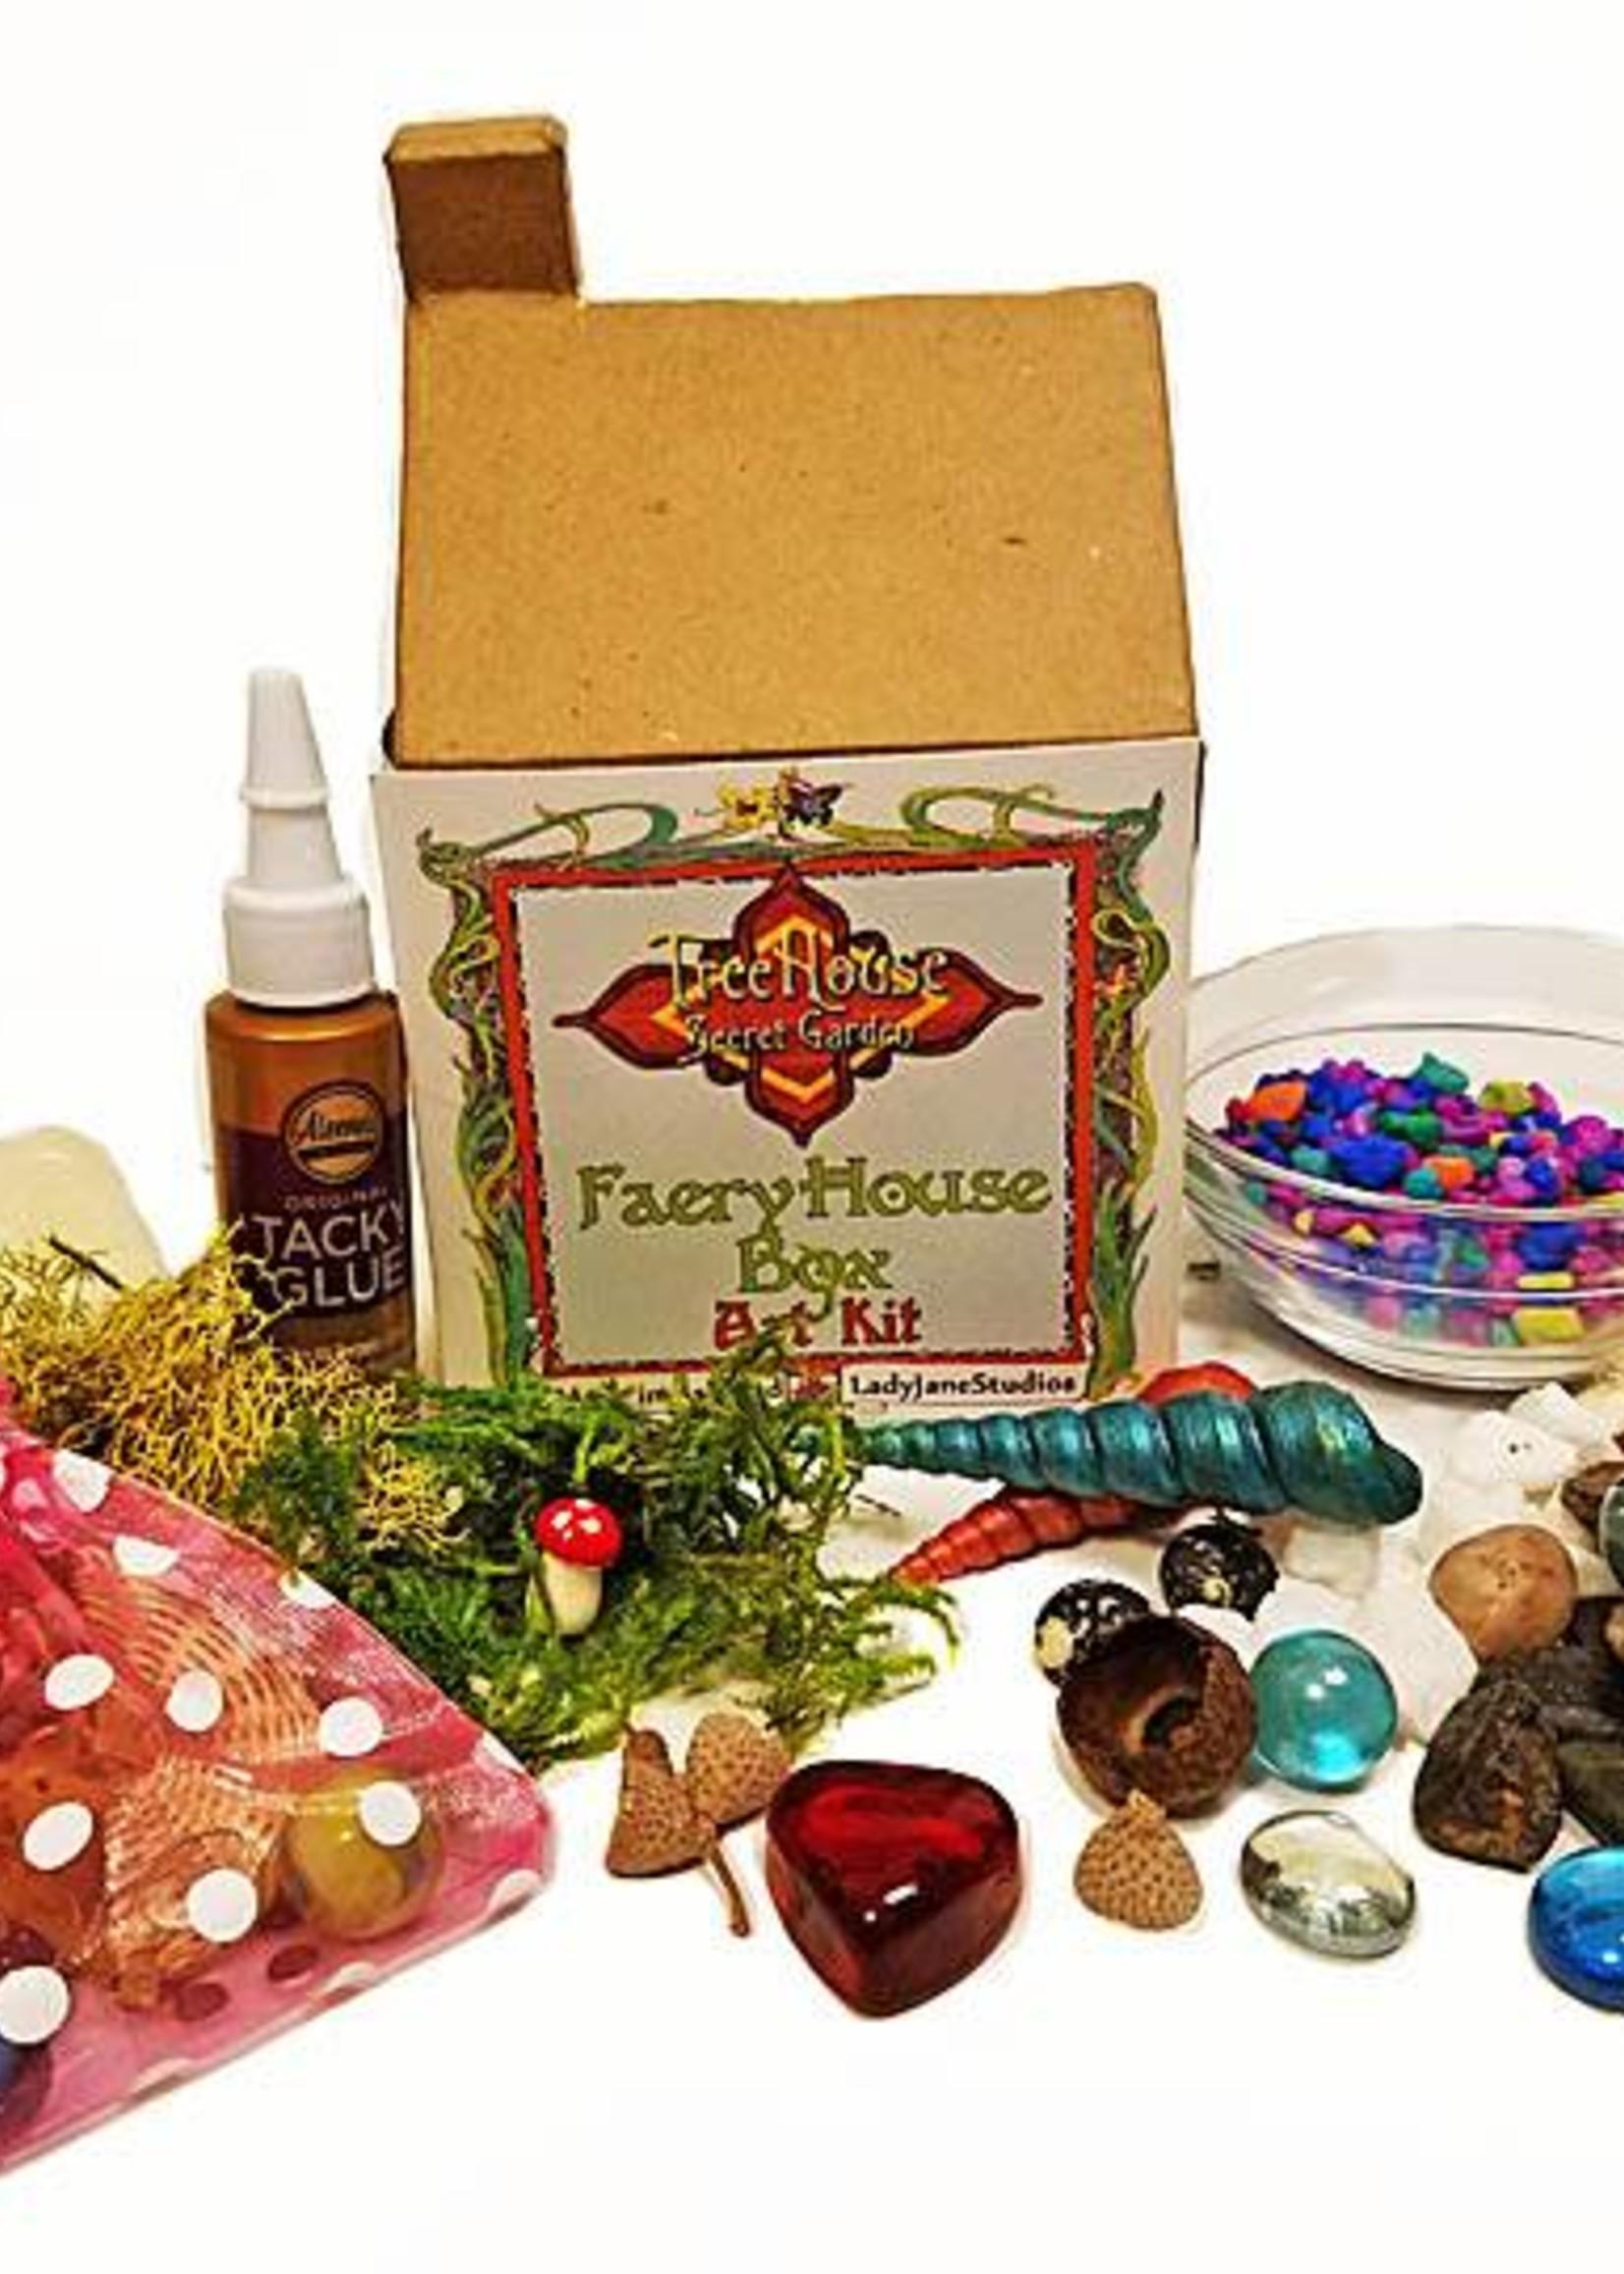 LadyJane Studios Faery House Box Art Kit